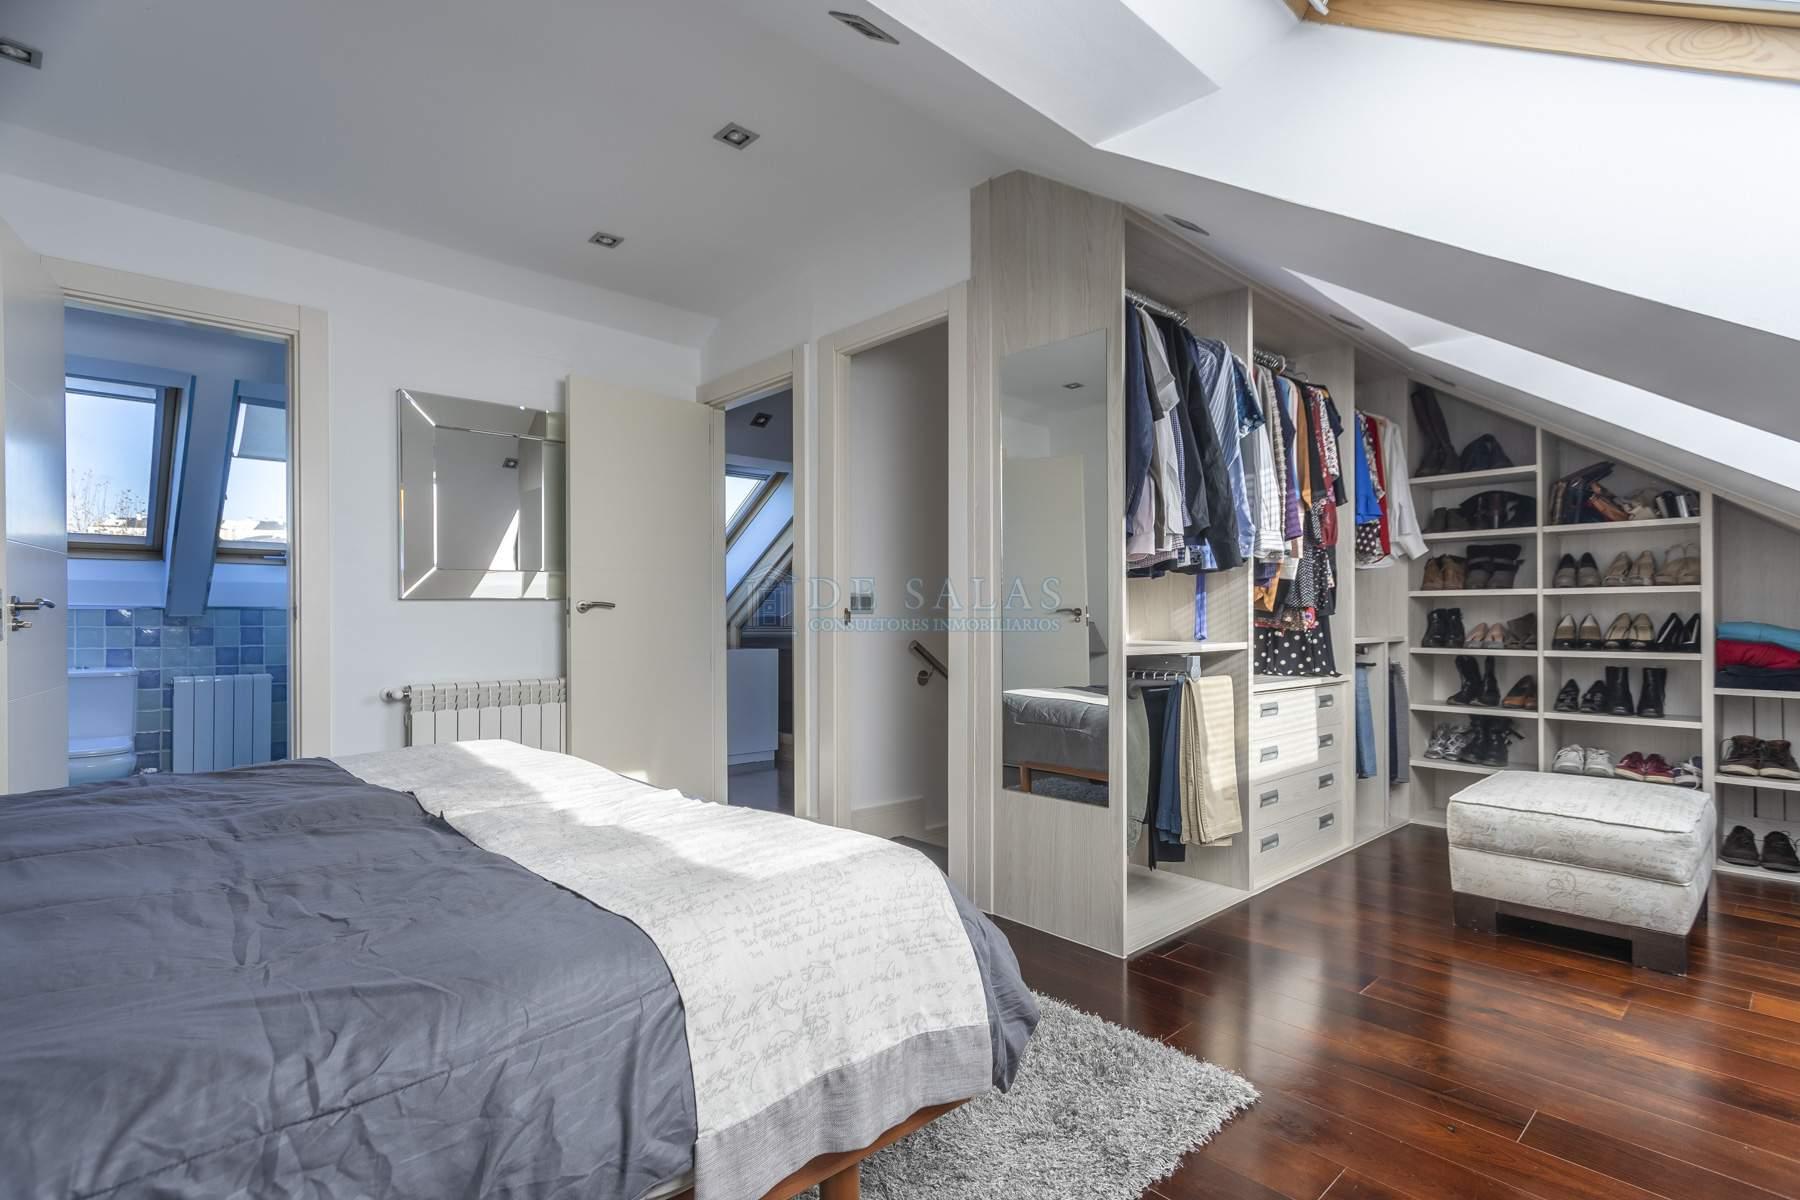 Dormitorio-25